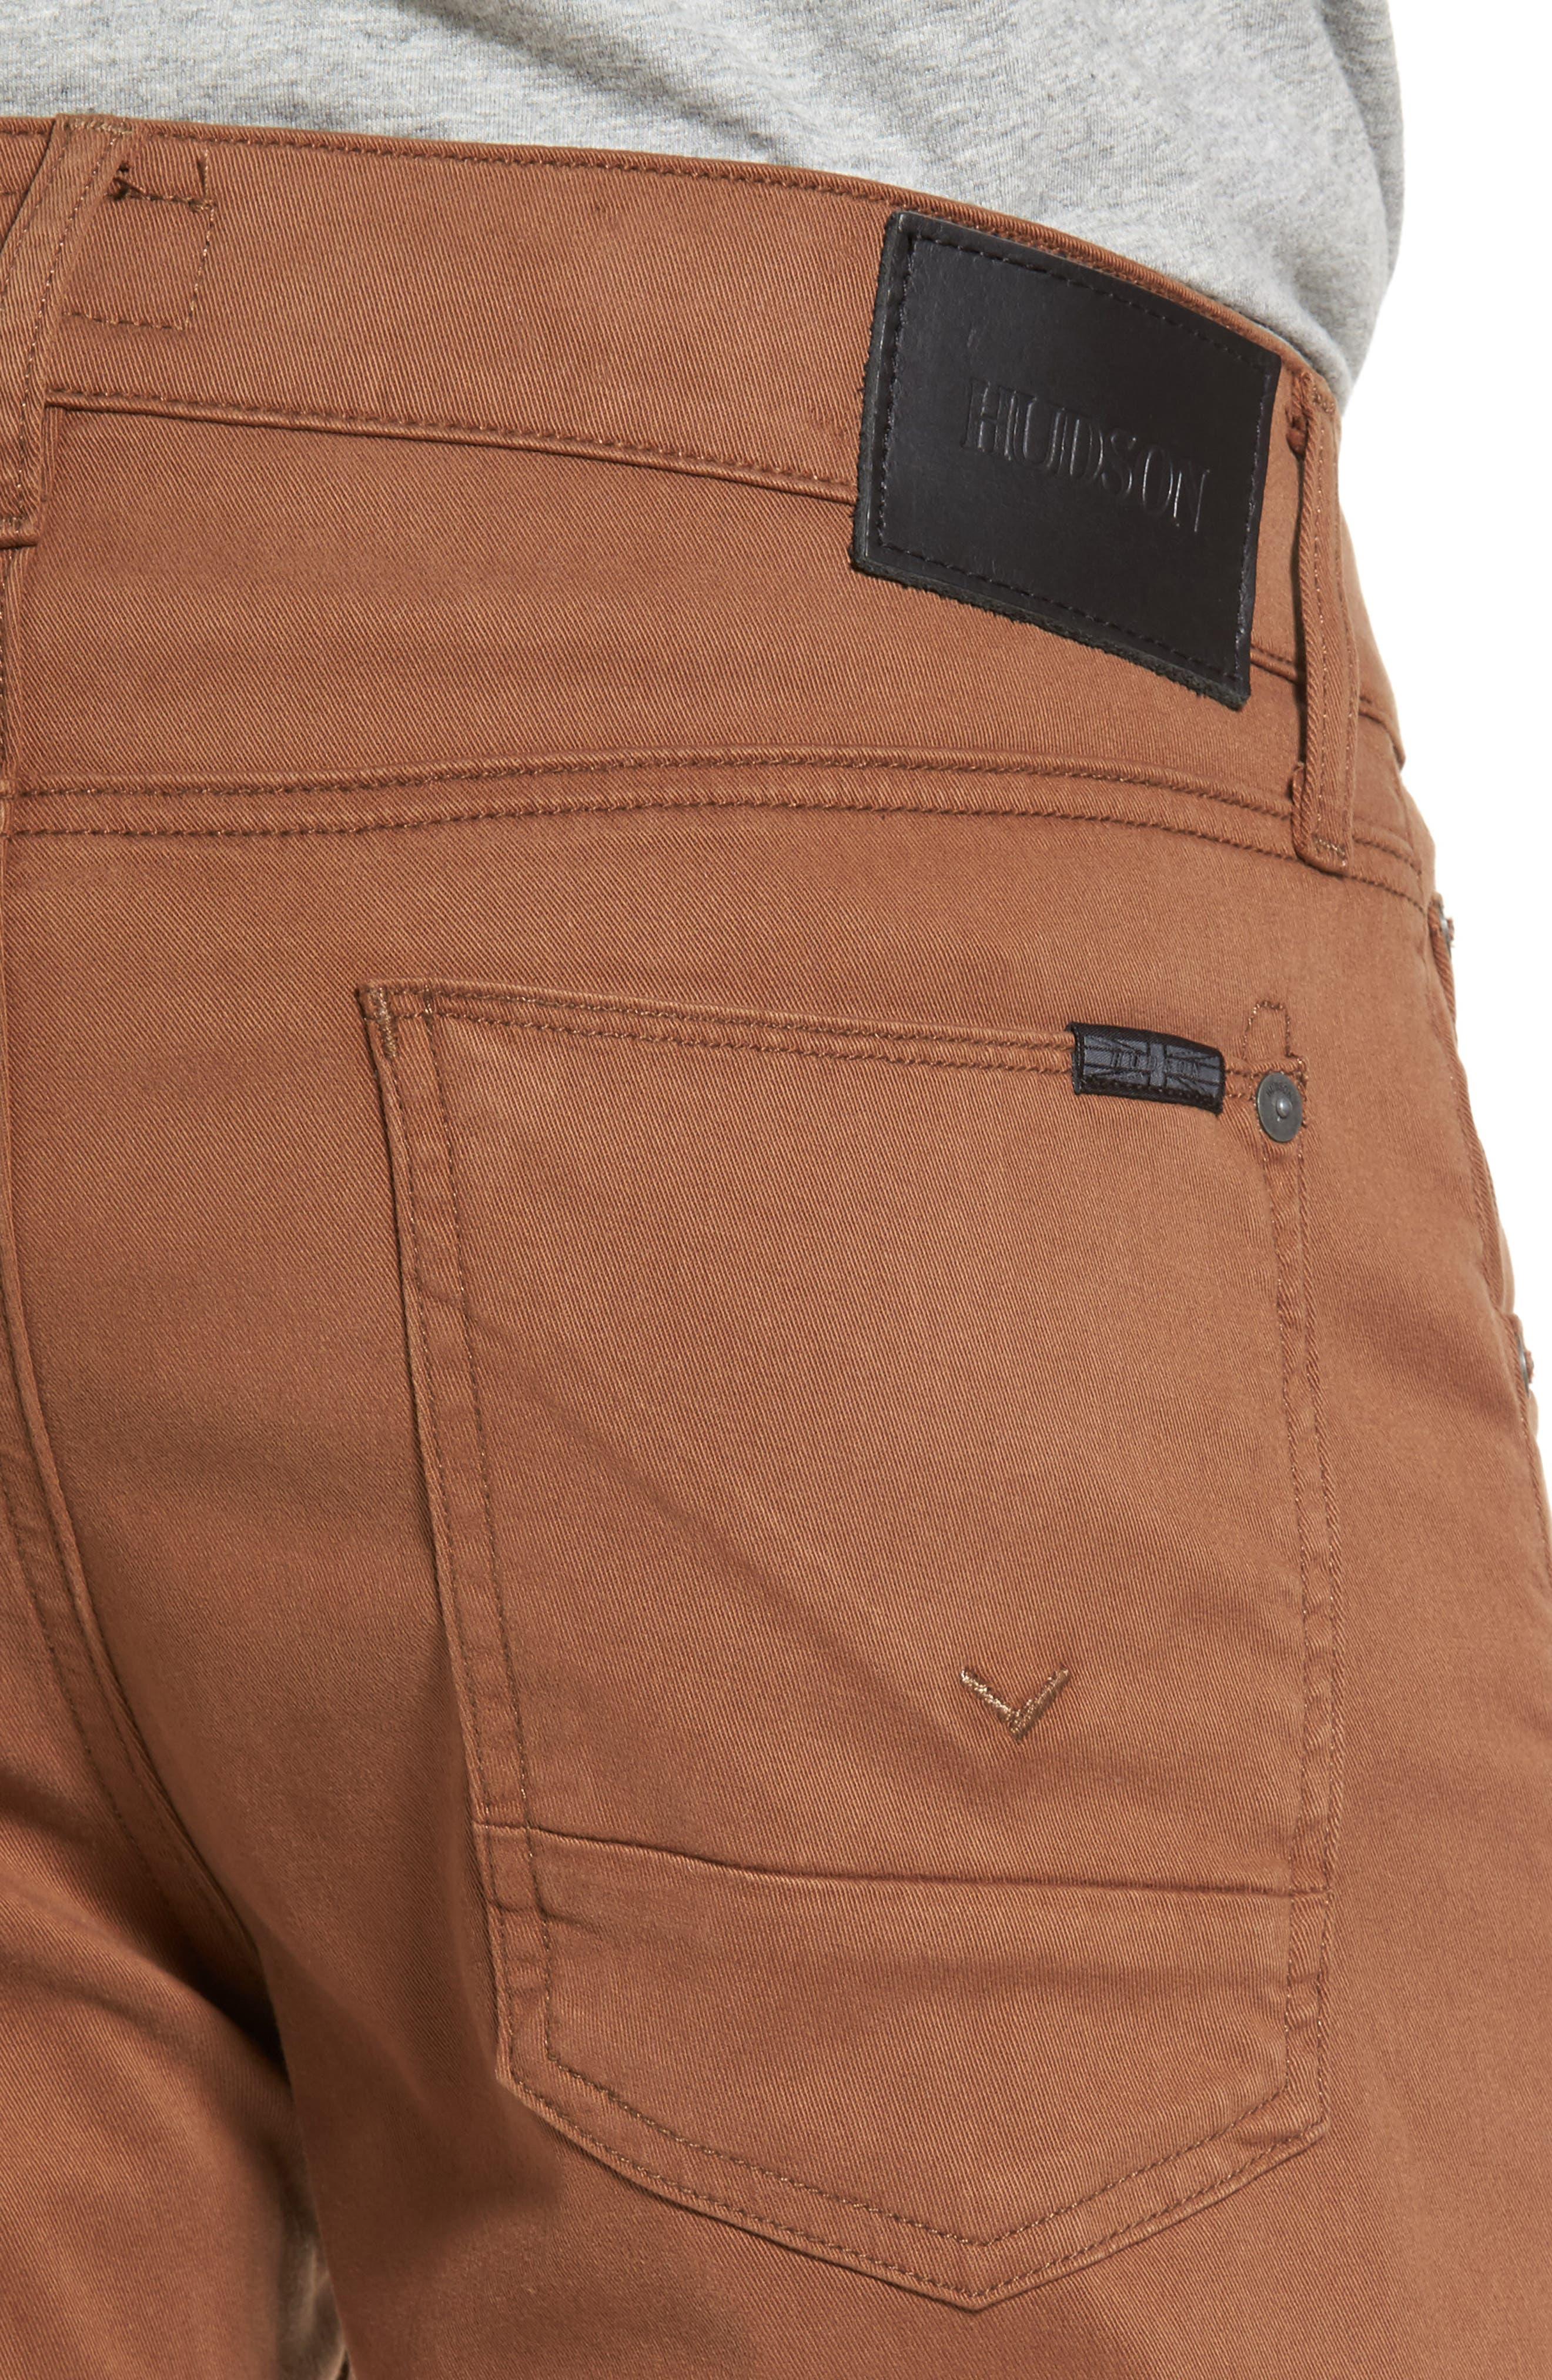 Blake Slim Fit Jeans,                             Alternate thumbnail 4, color,                             Masonite